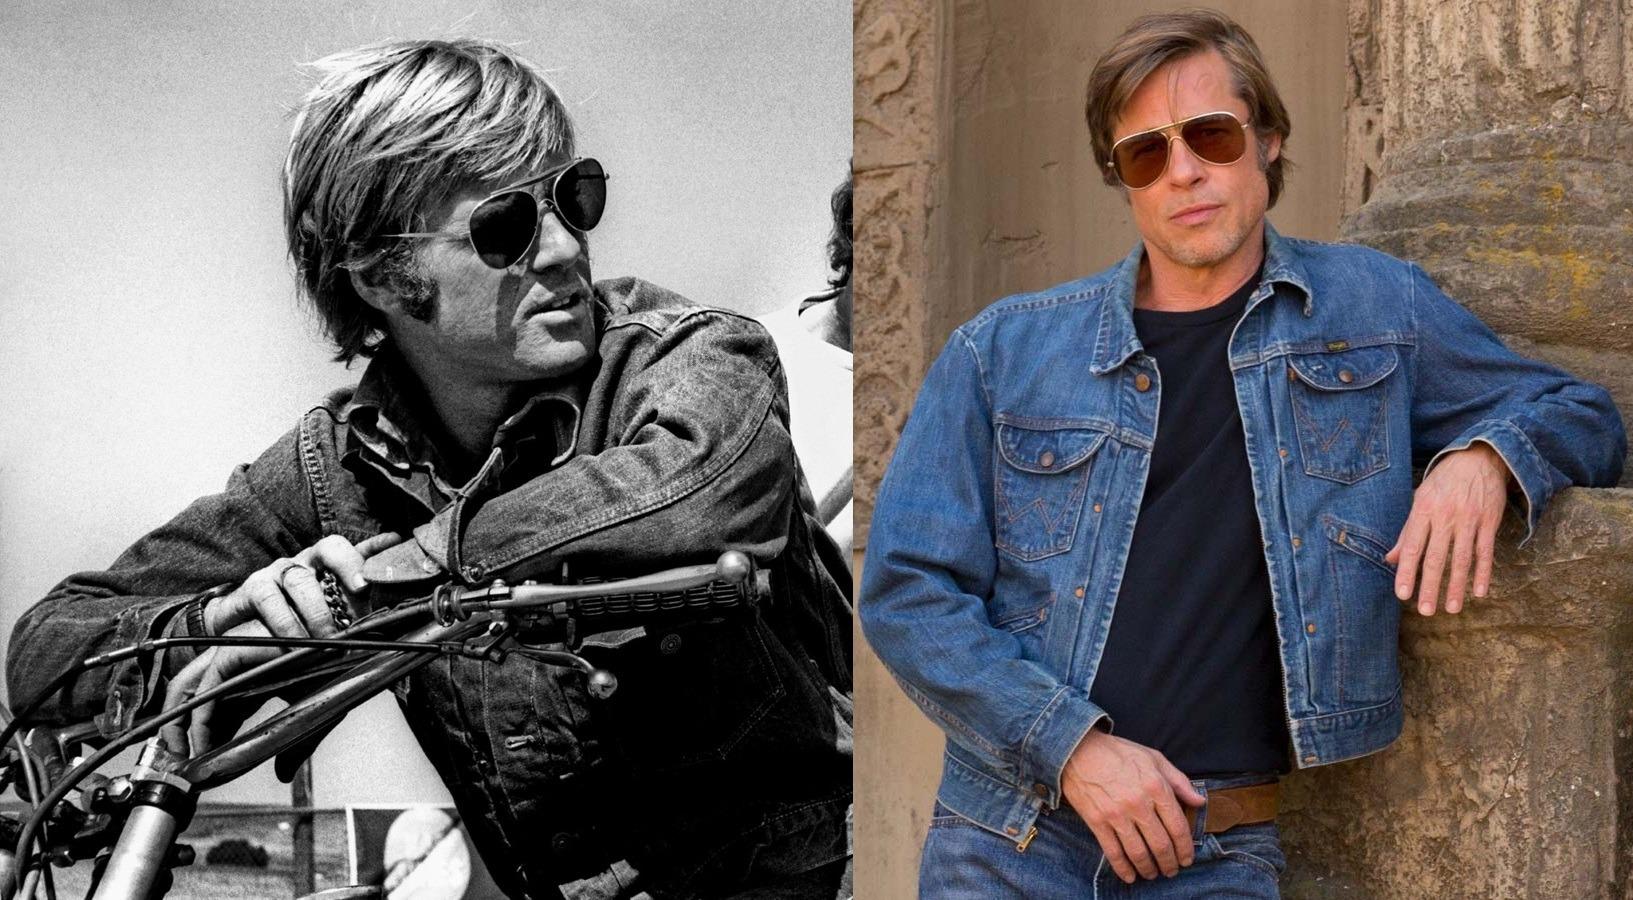 Robert Redford & Brad Pitt